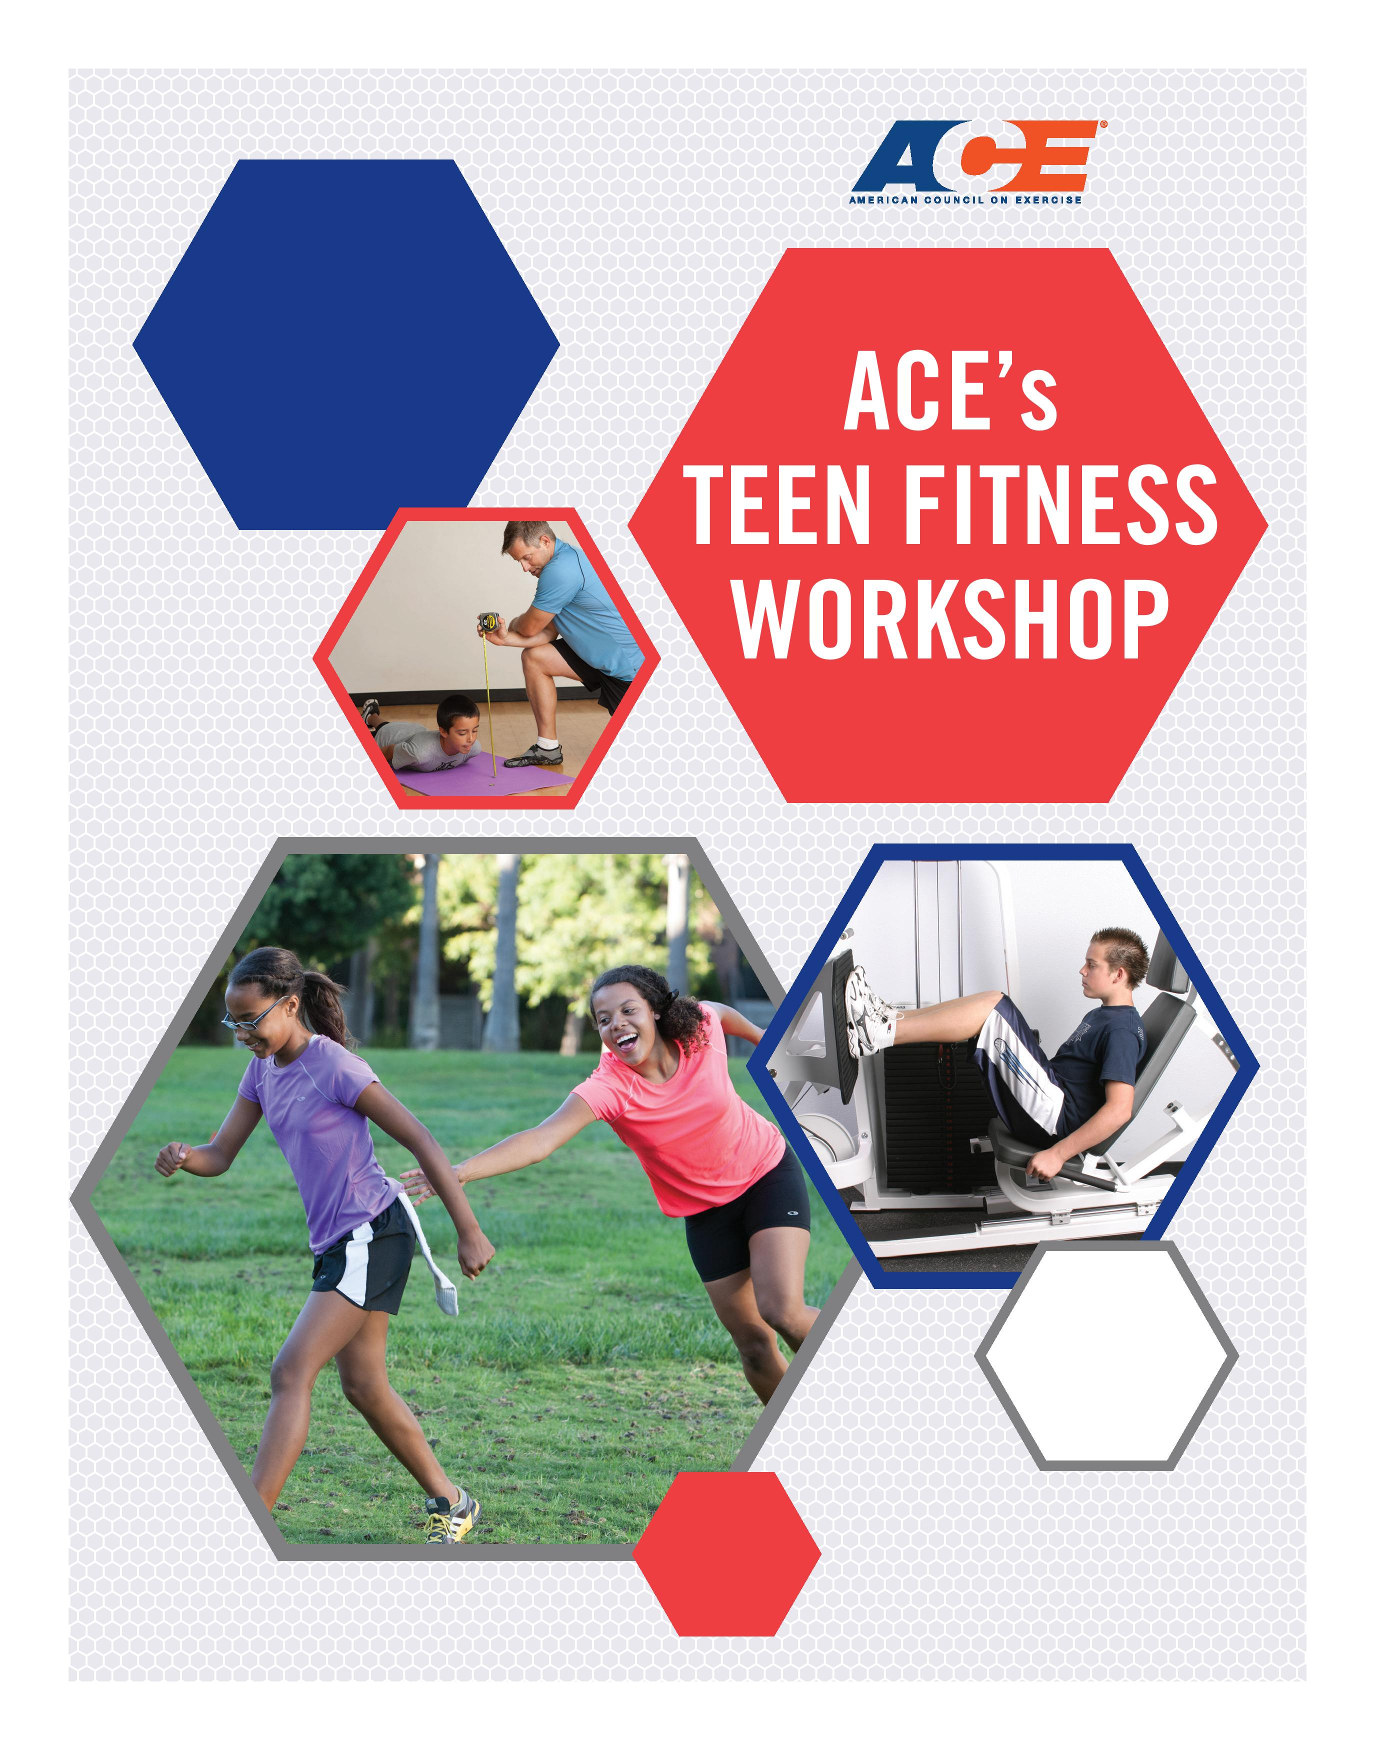 7b45d89fe8 Teen Fitness Workshop by ACE - grafts.gr